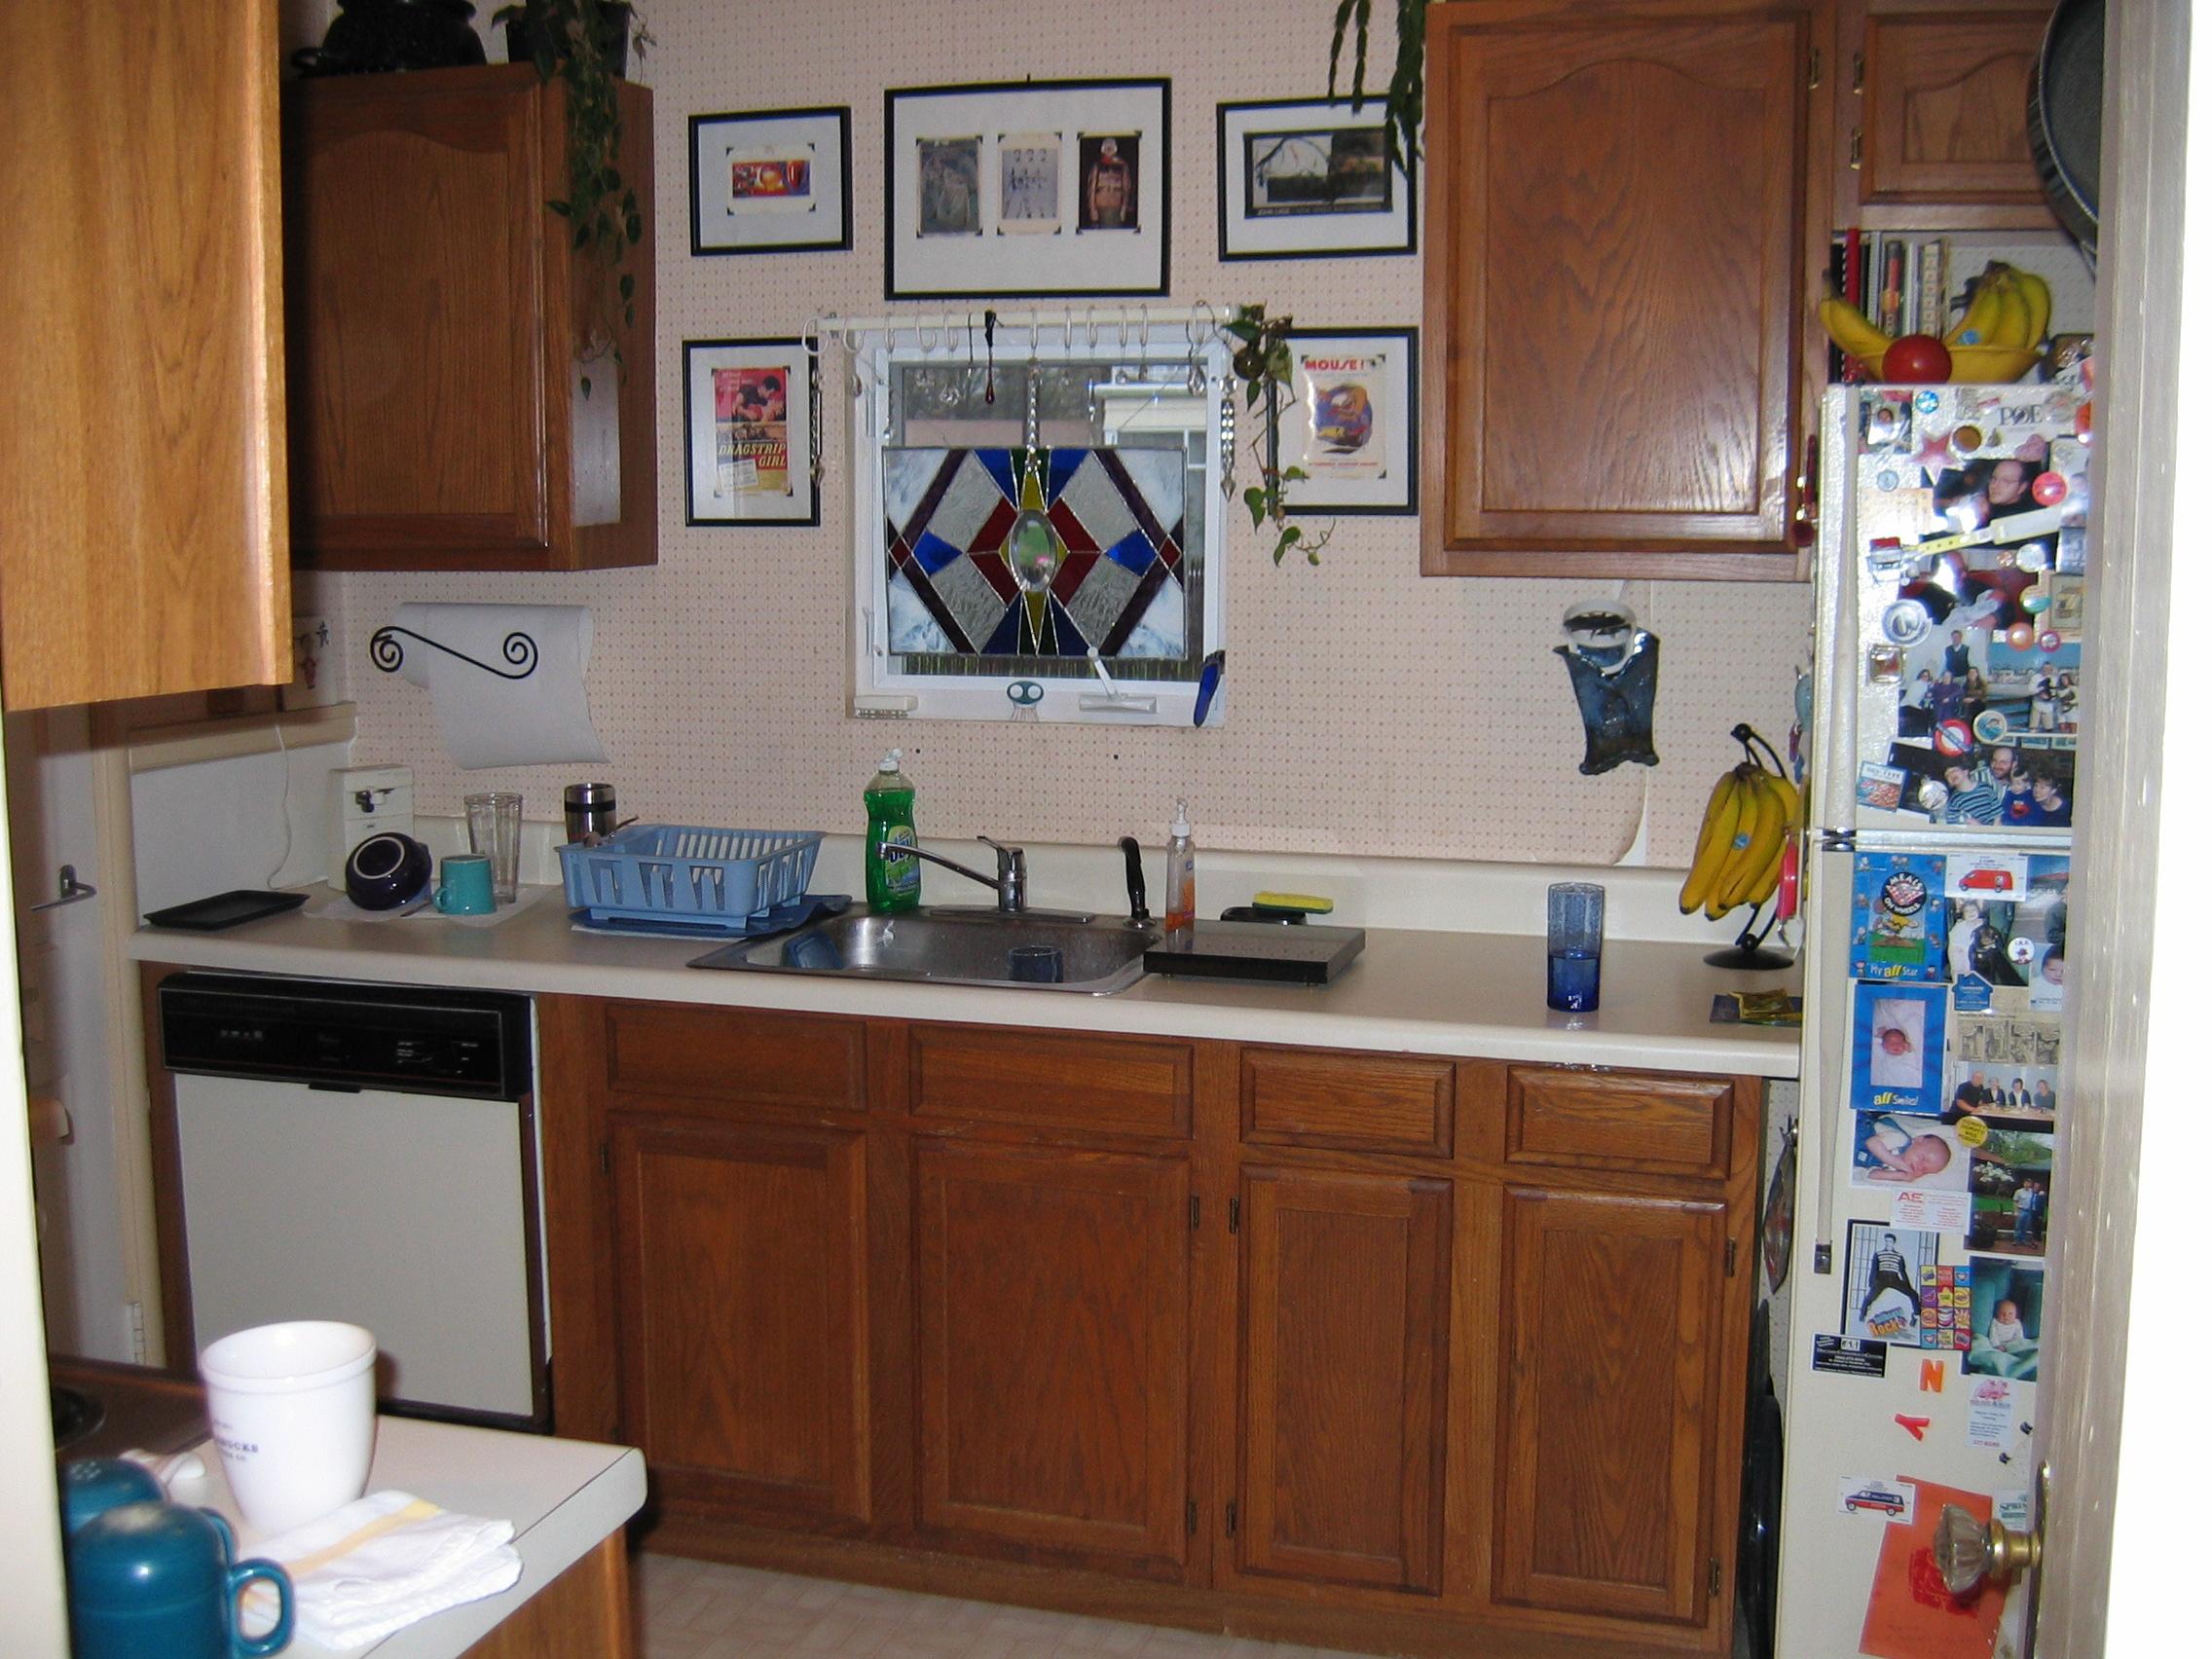 kitchen renovation richmond va kitchen remodel richmond va BEFORE kitchen sink wall